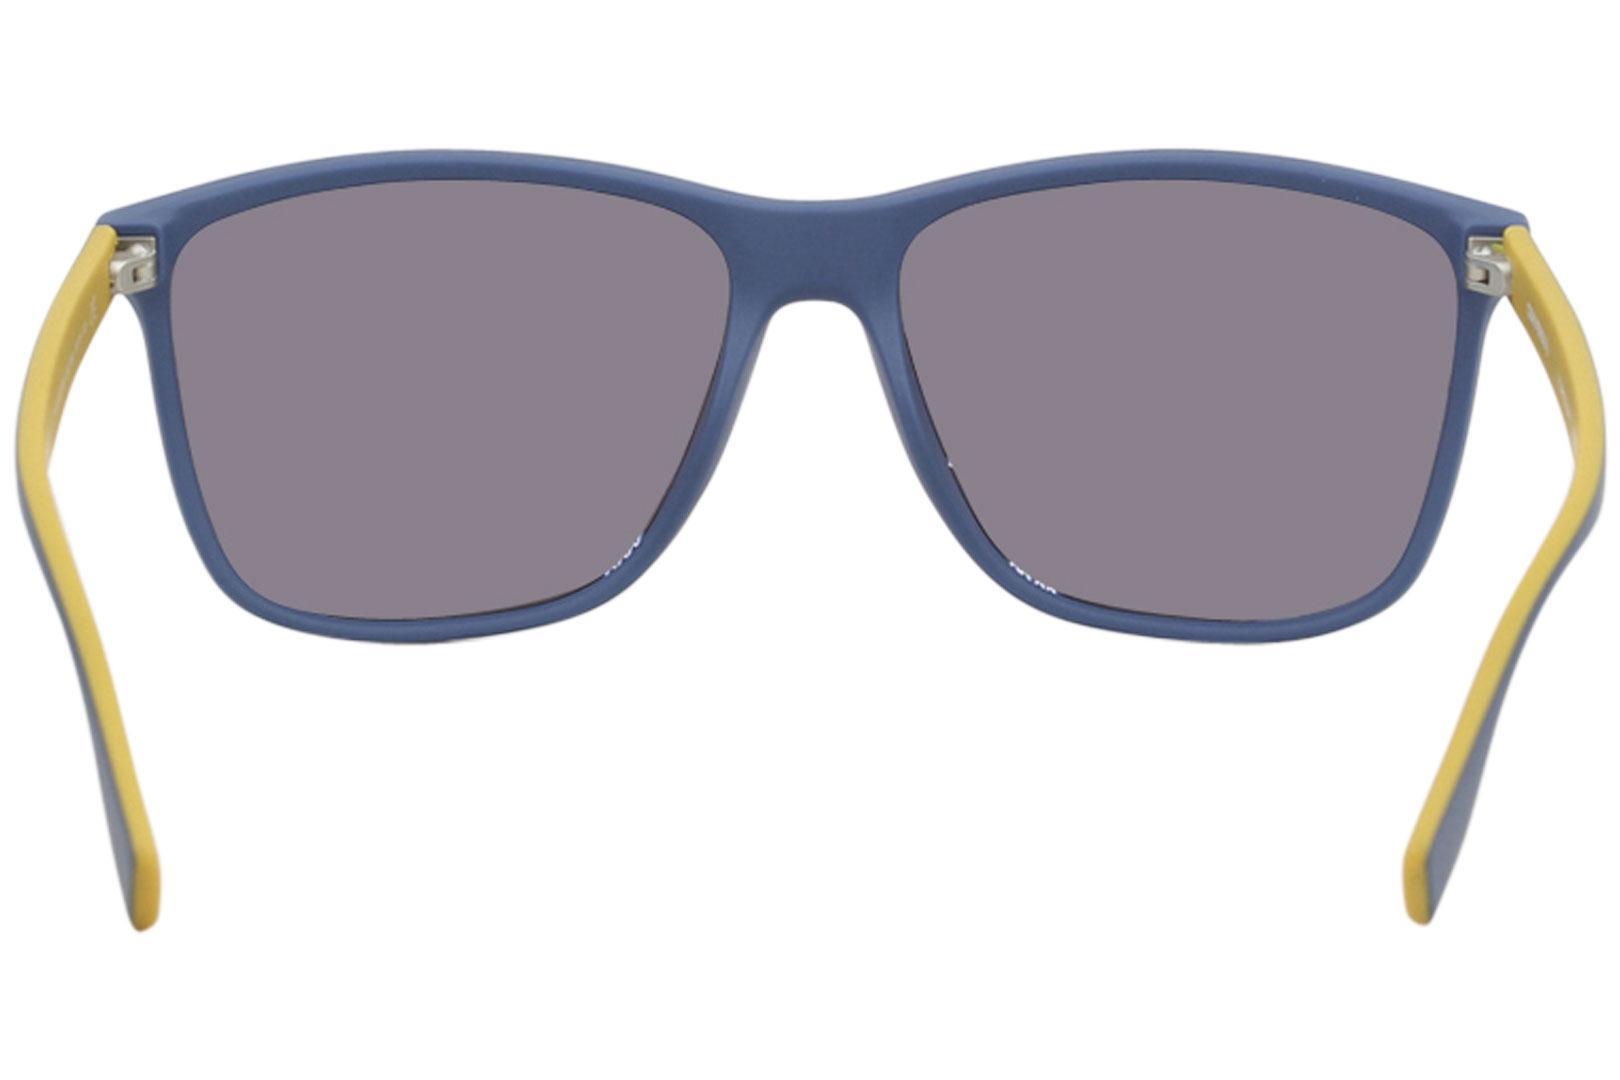 dca426c74c0 Converse Men s SCO050 SCO 050 Polarized Fashion Rectangle Sunglasses by  Converse. Touch to zoom